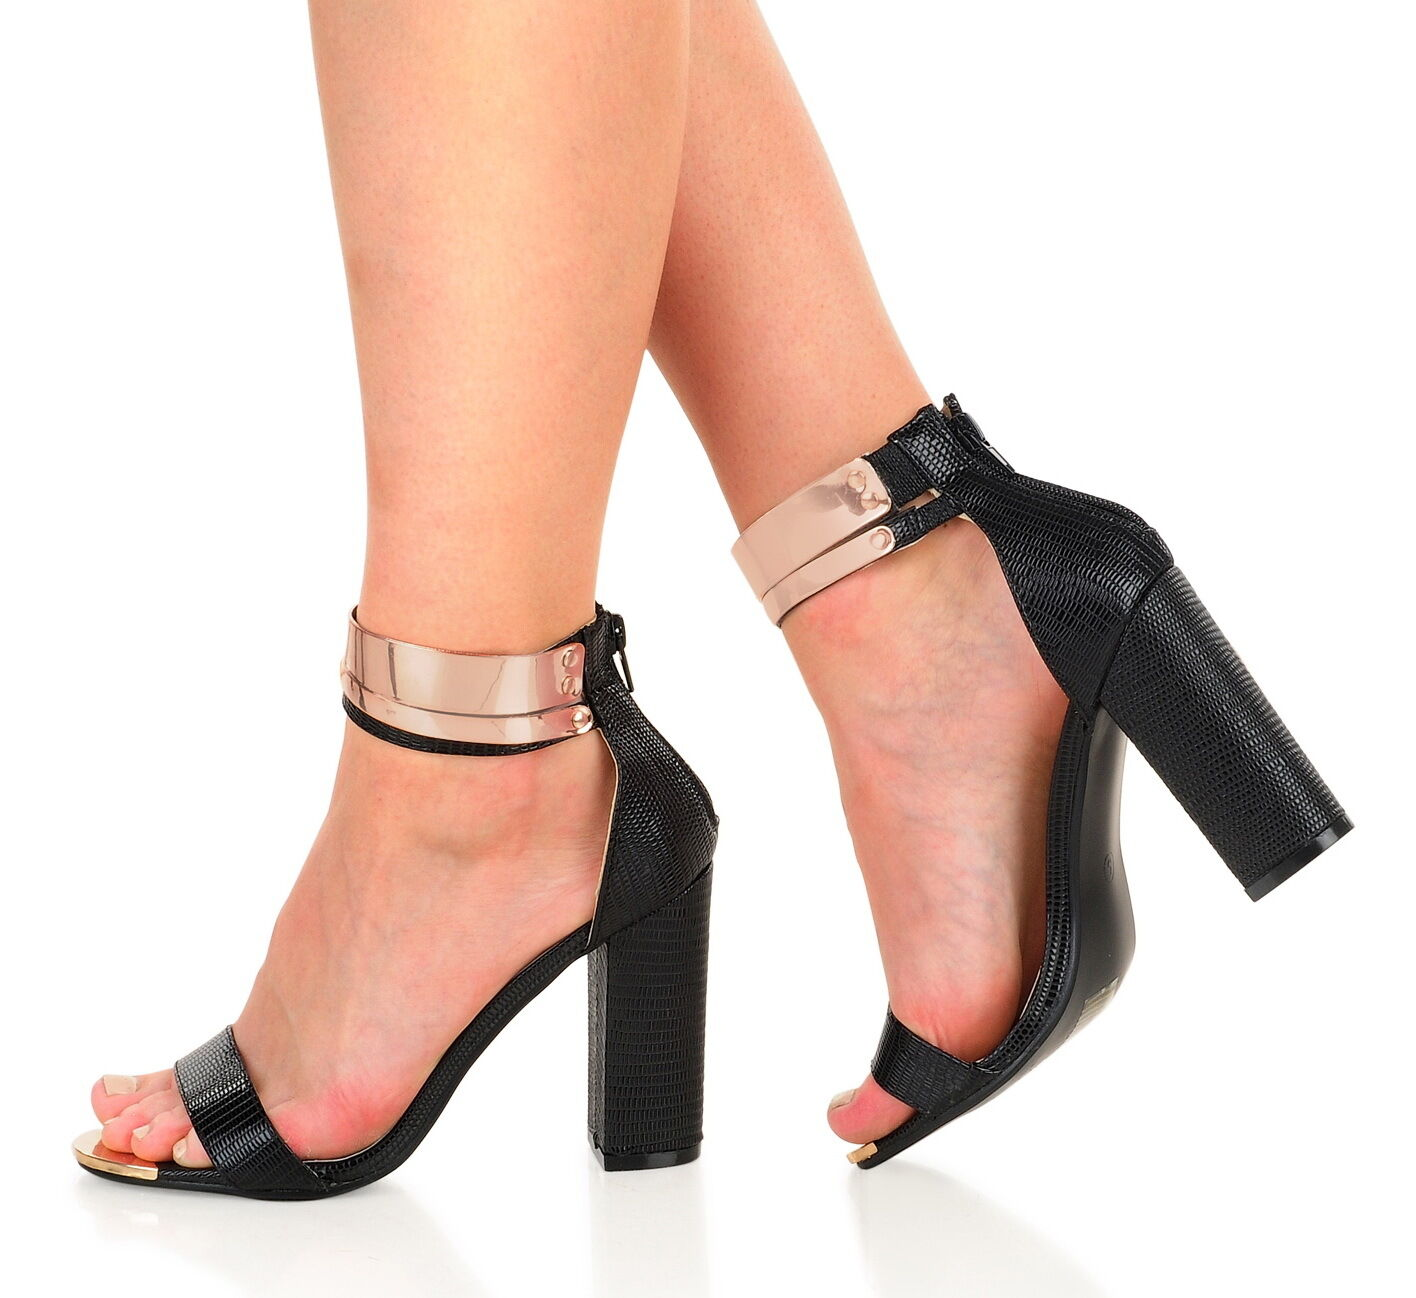 Black Black Black Lizard Block High Heel Open Toe Shoes Sandals - US 7.5/UK5/ EU38 be7963